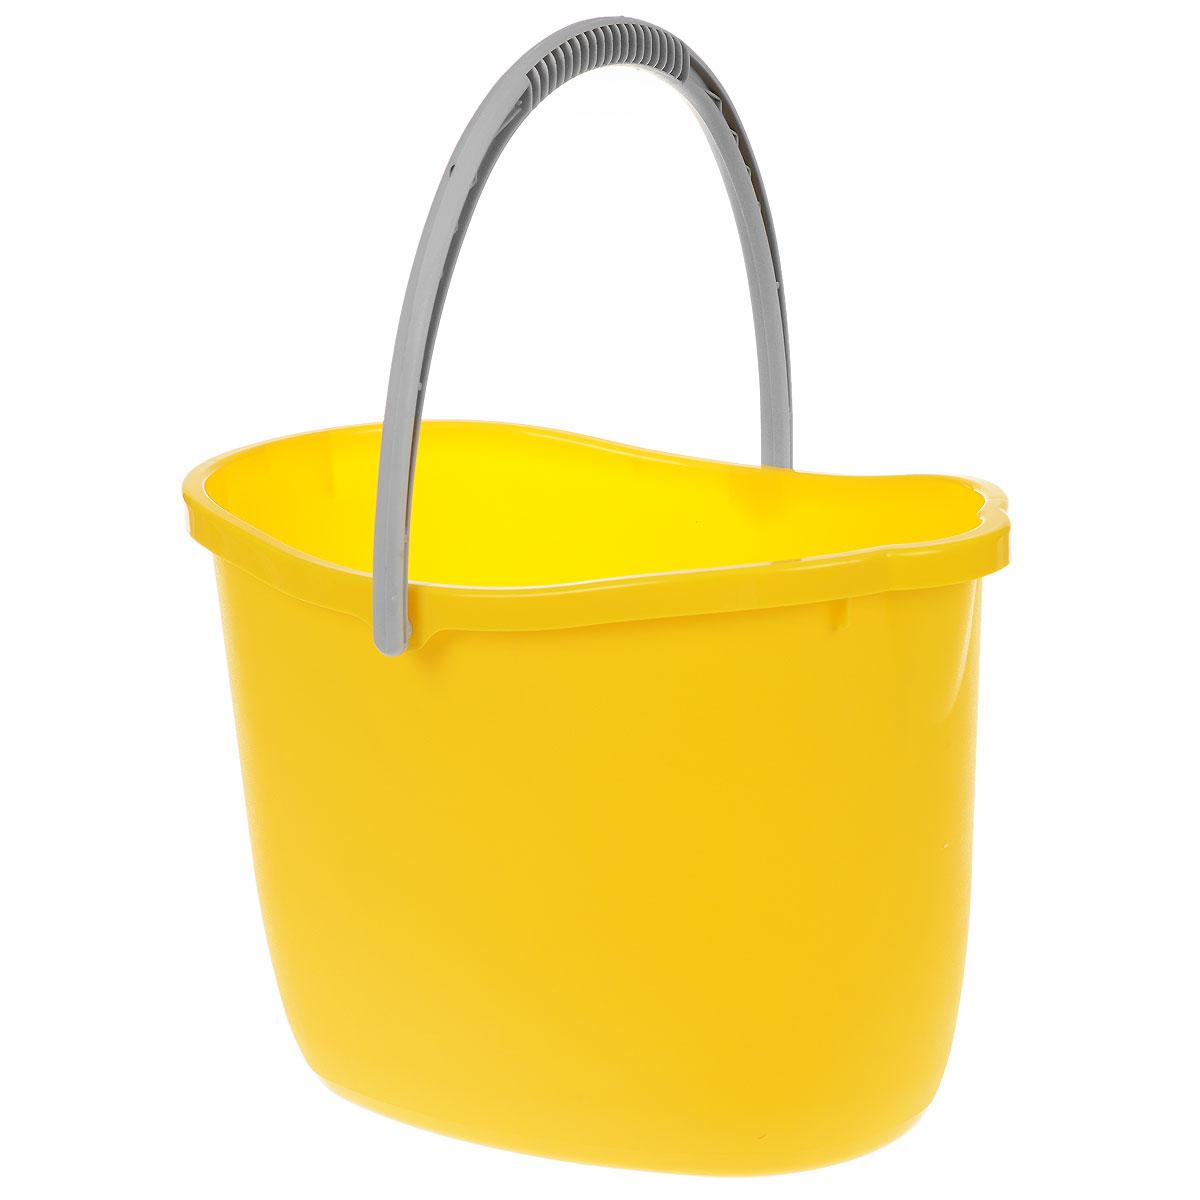 "Ведро ""Apex"", цвет: желтый, 15 л. 10365"